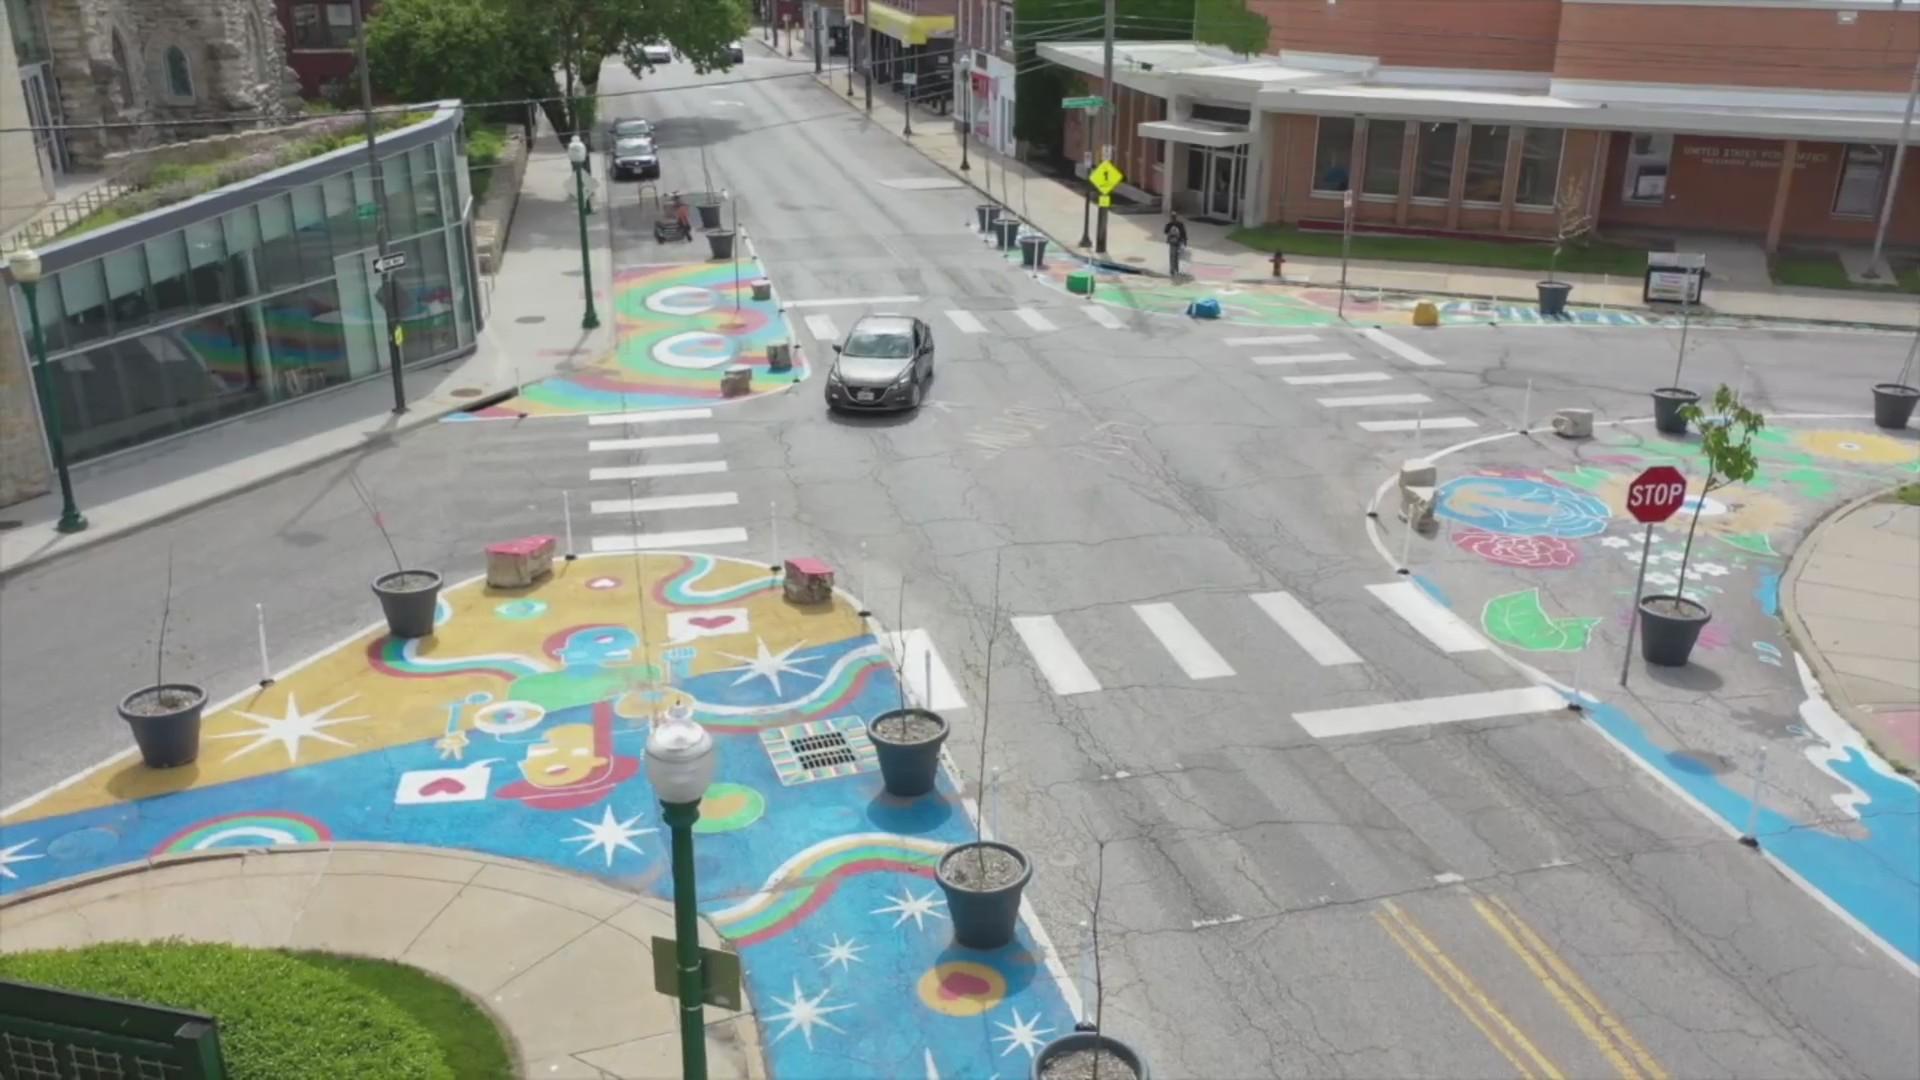 westport street art